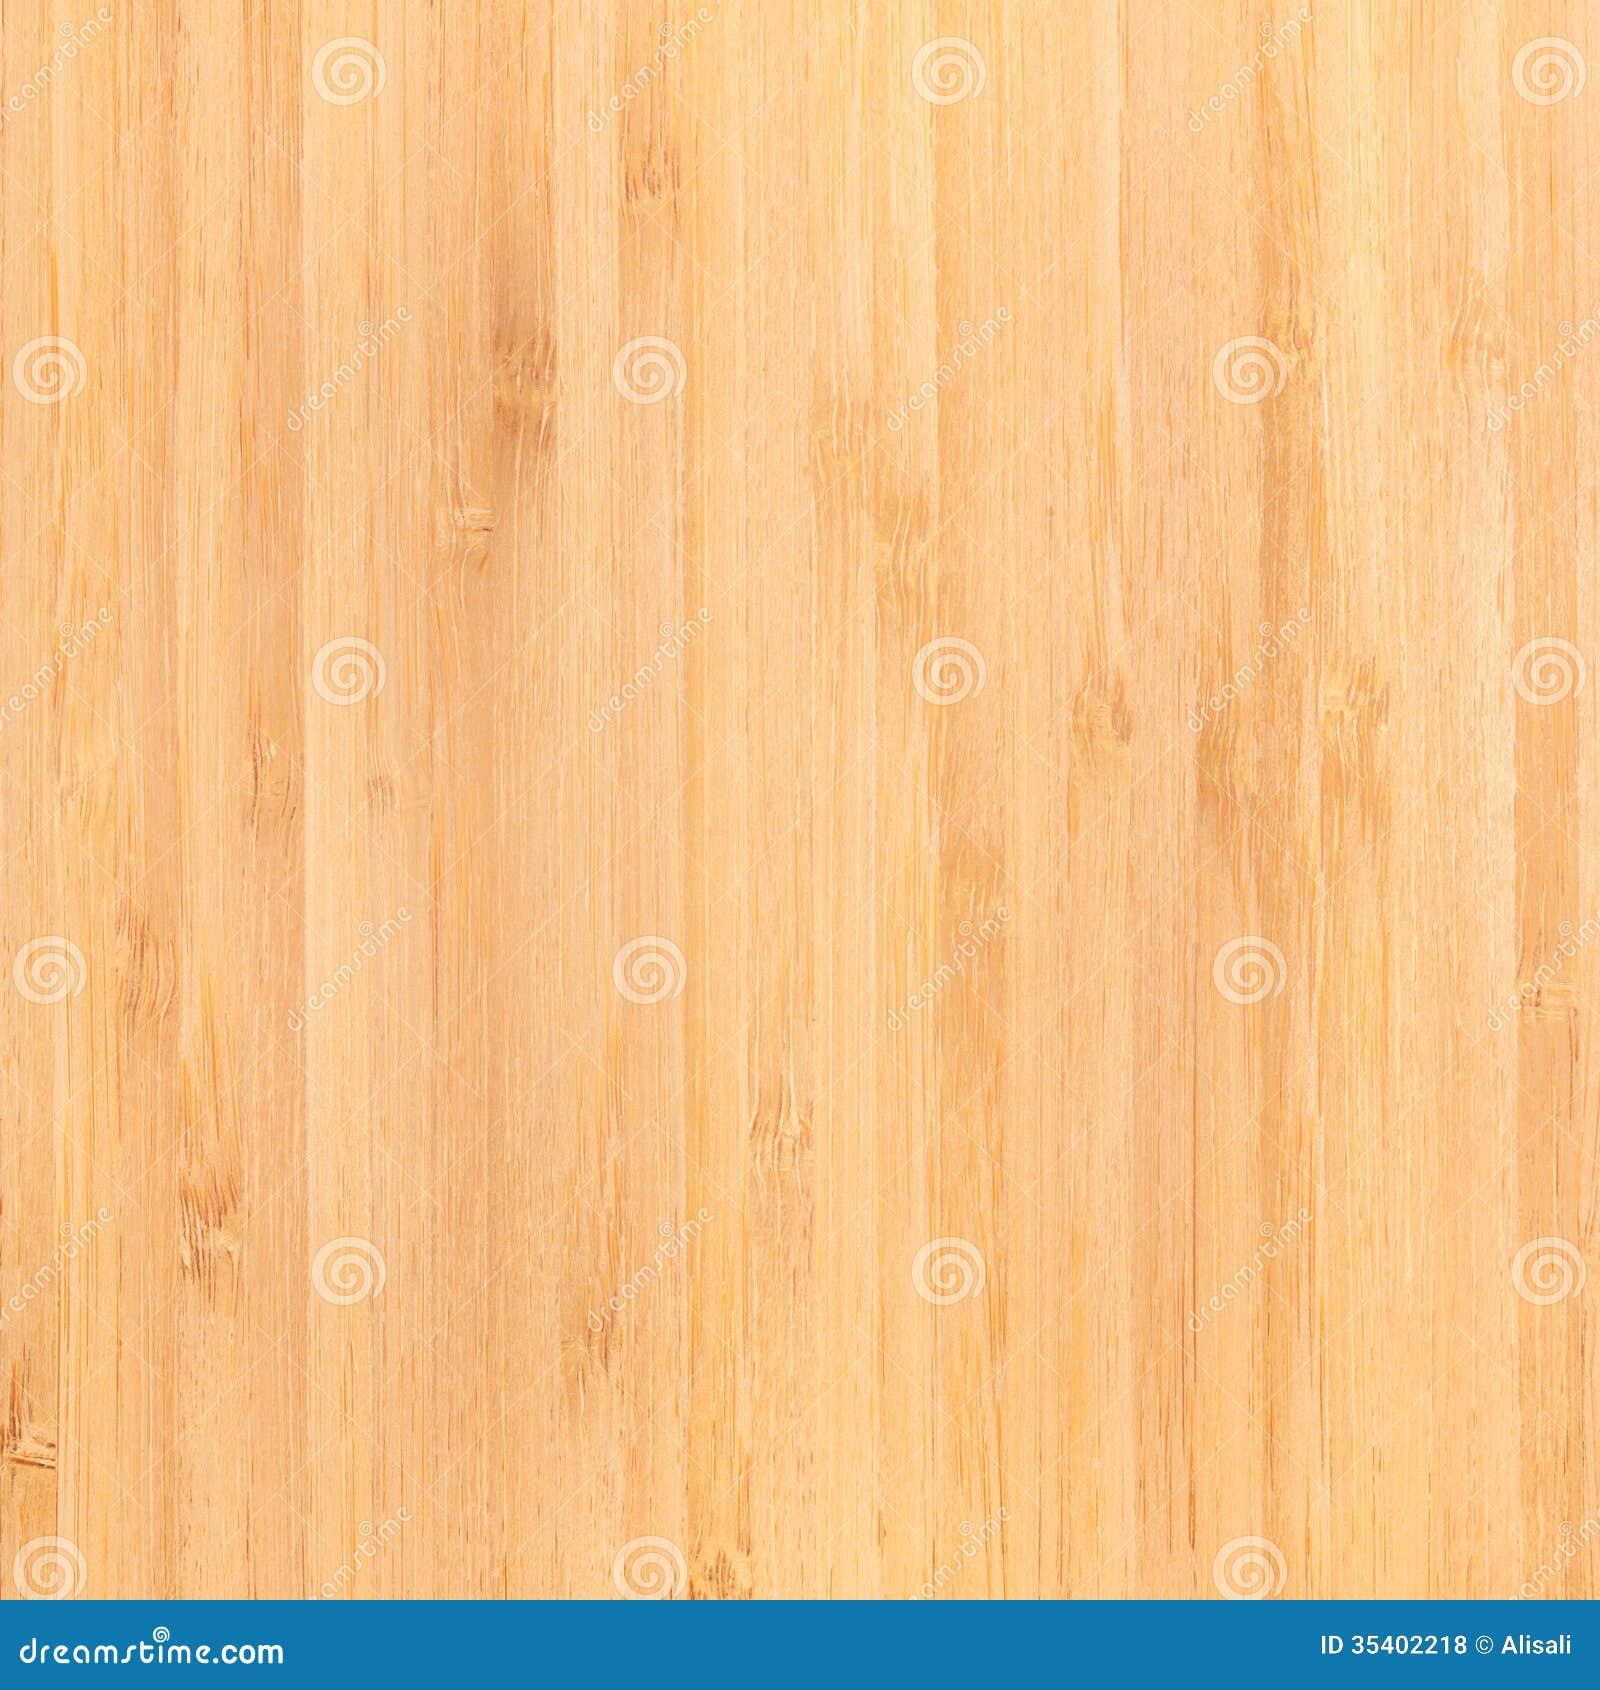 Texture Bamboo, Wood Grain Royalty Free Stock Photos ...